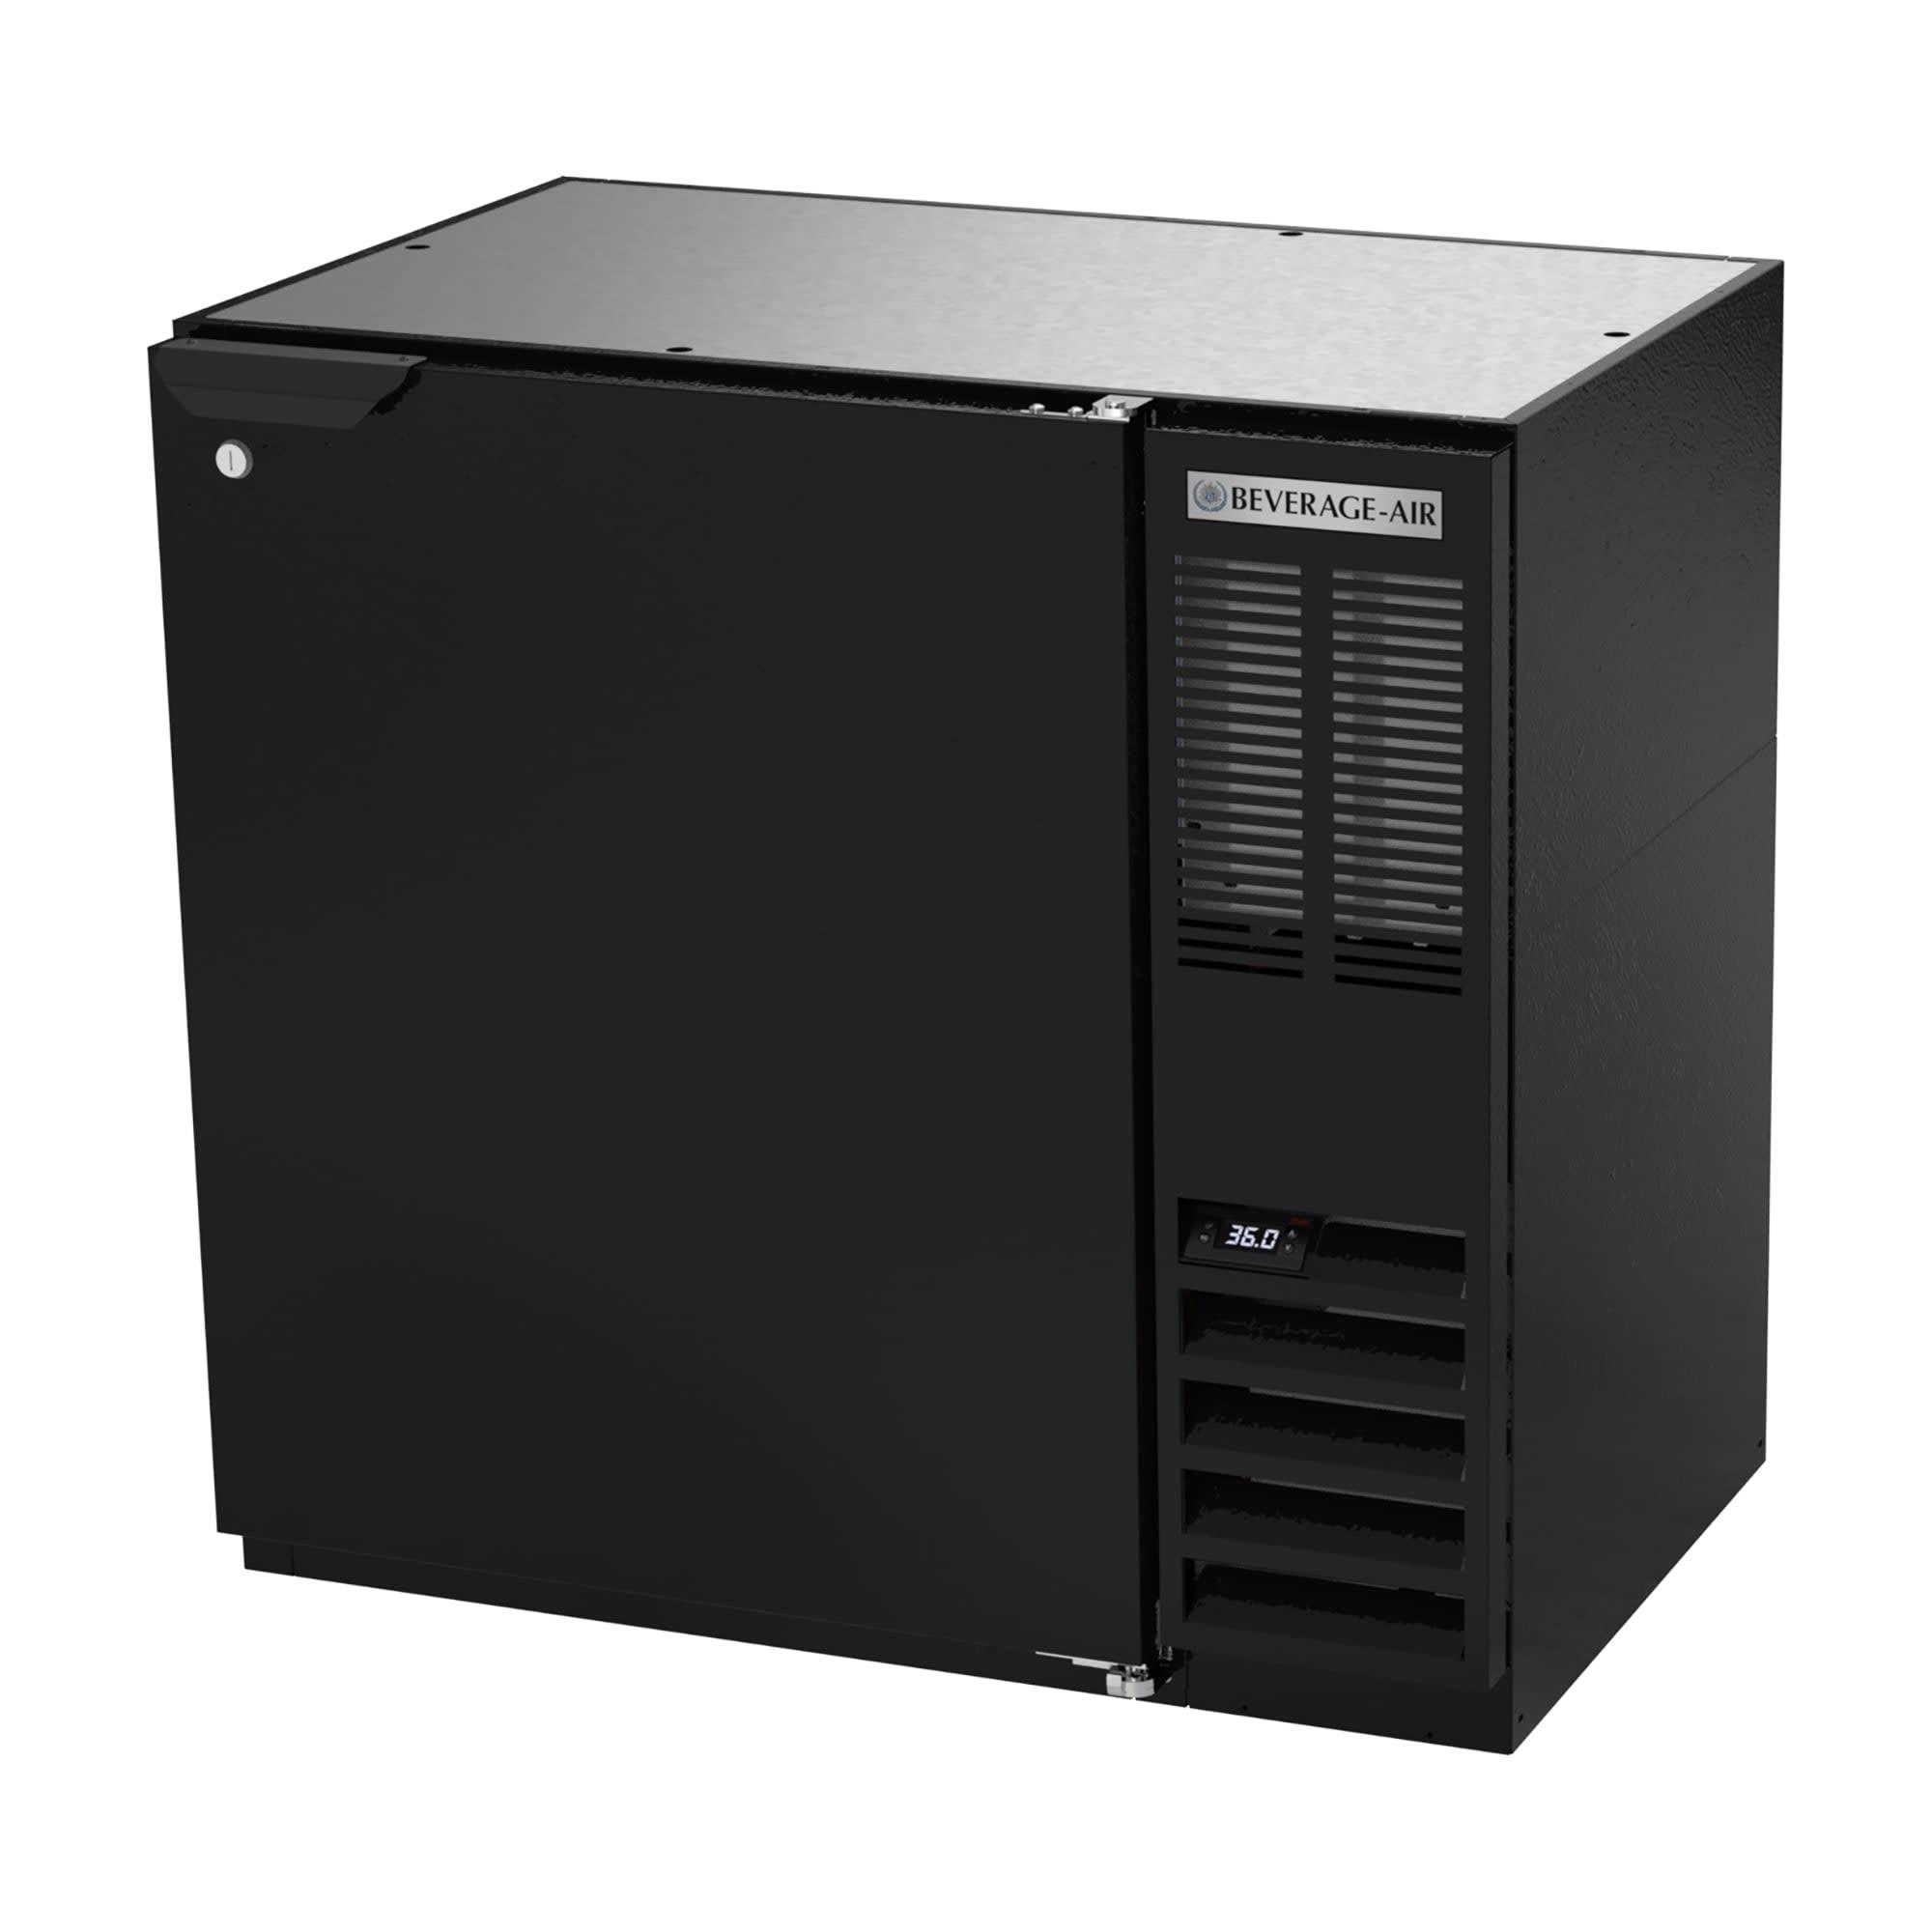 "Beverage Air BB36HC-1-F-B 36"" (1) Section Bar Refrigerator - Swinging Solid Door, 115v"